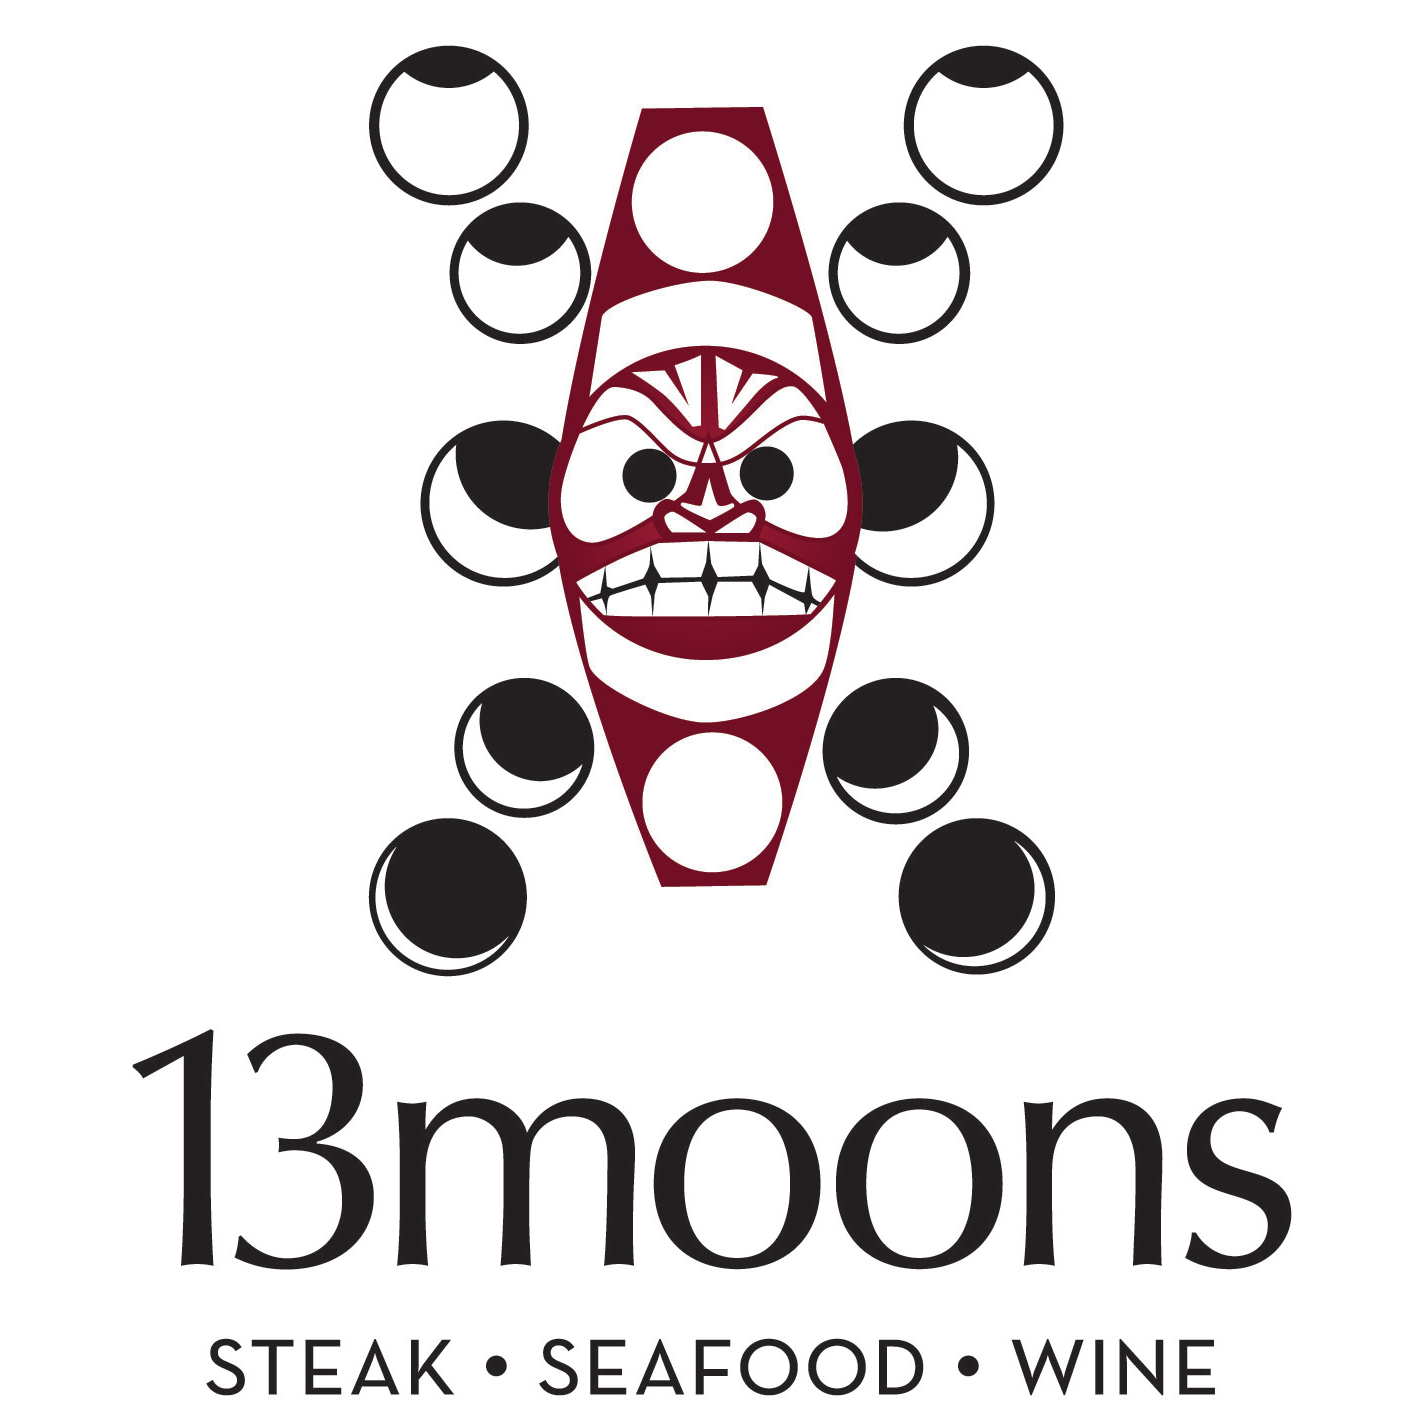 13moons Restaurant